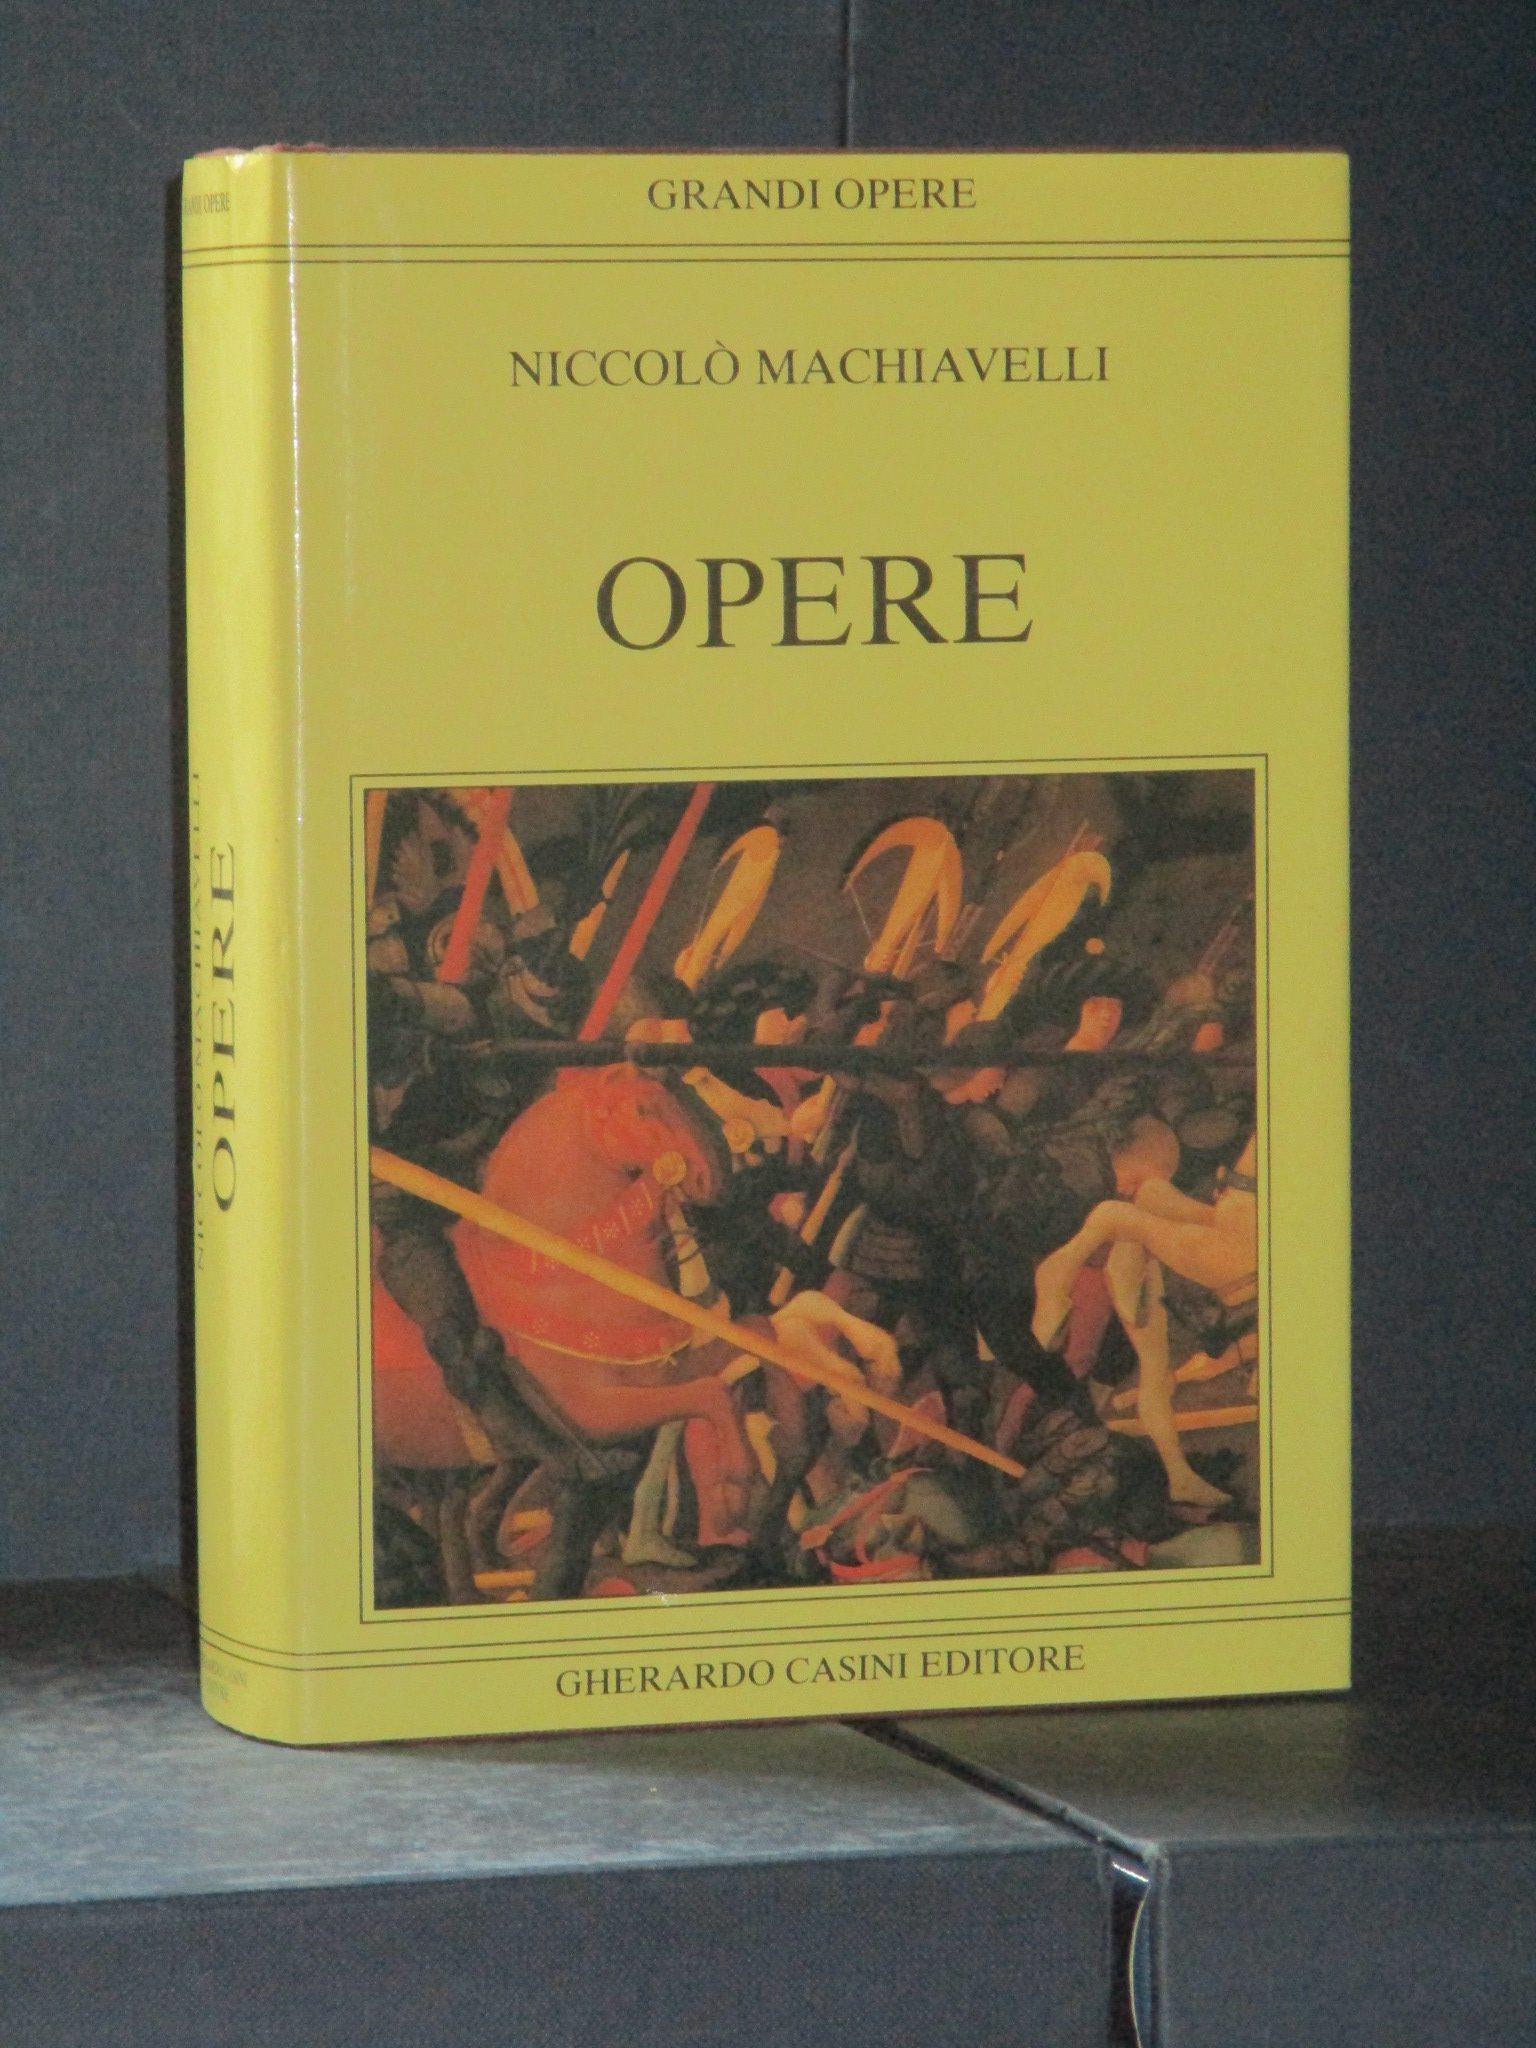 Niccolò Machiavelli - Opere - Casini, Grandi Opere - 1989